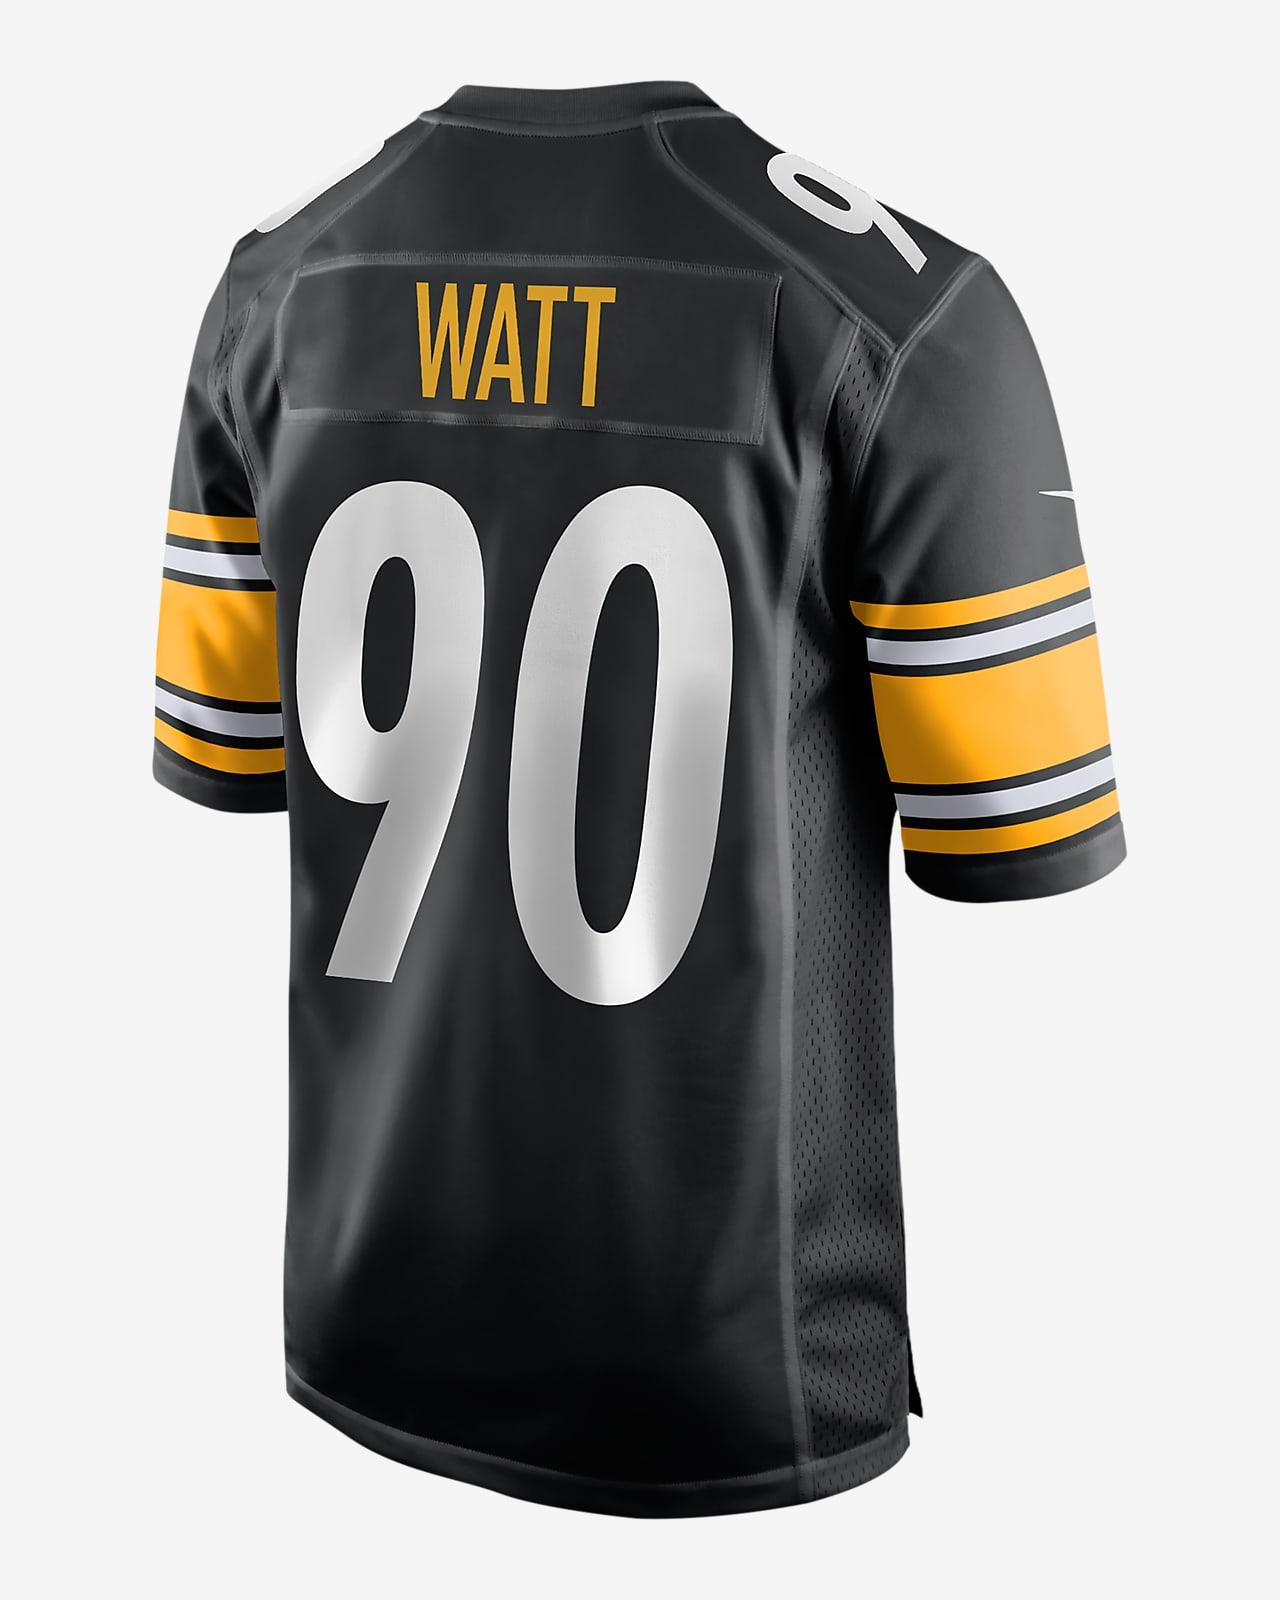 NFL Pittsburgh Steelers (T.J. Watt) Men's Game Football Jersey